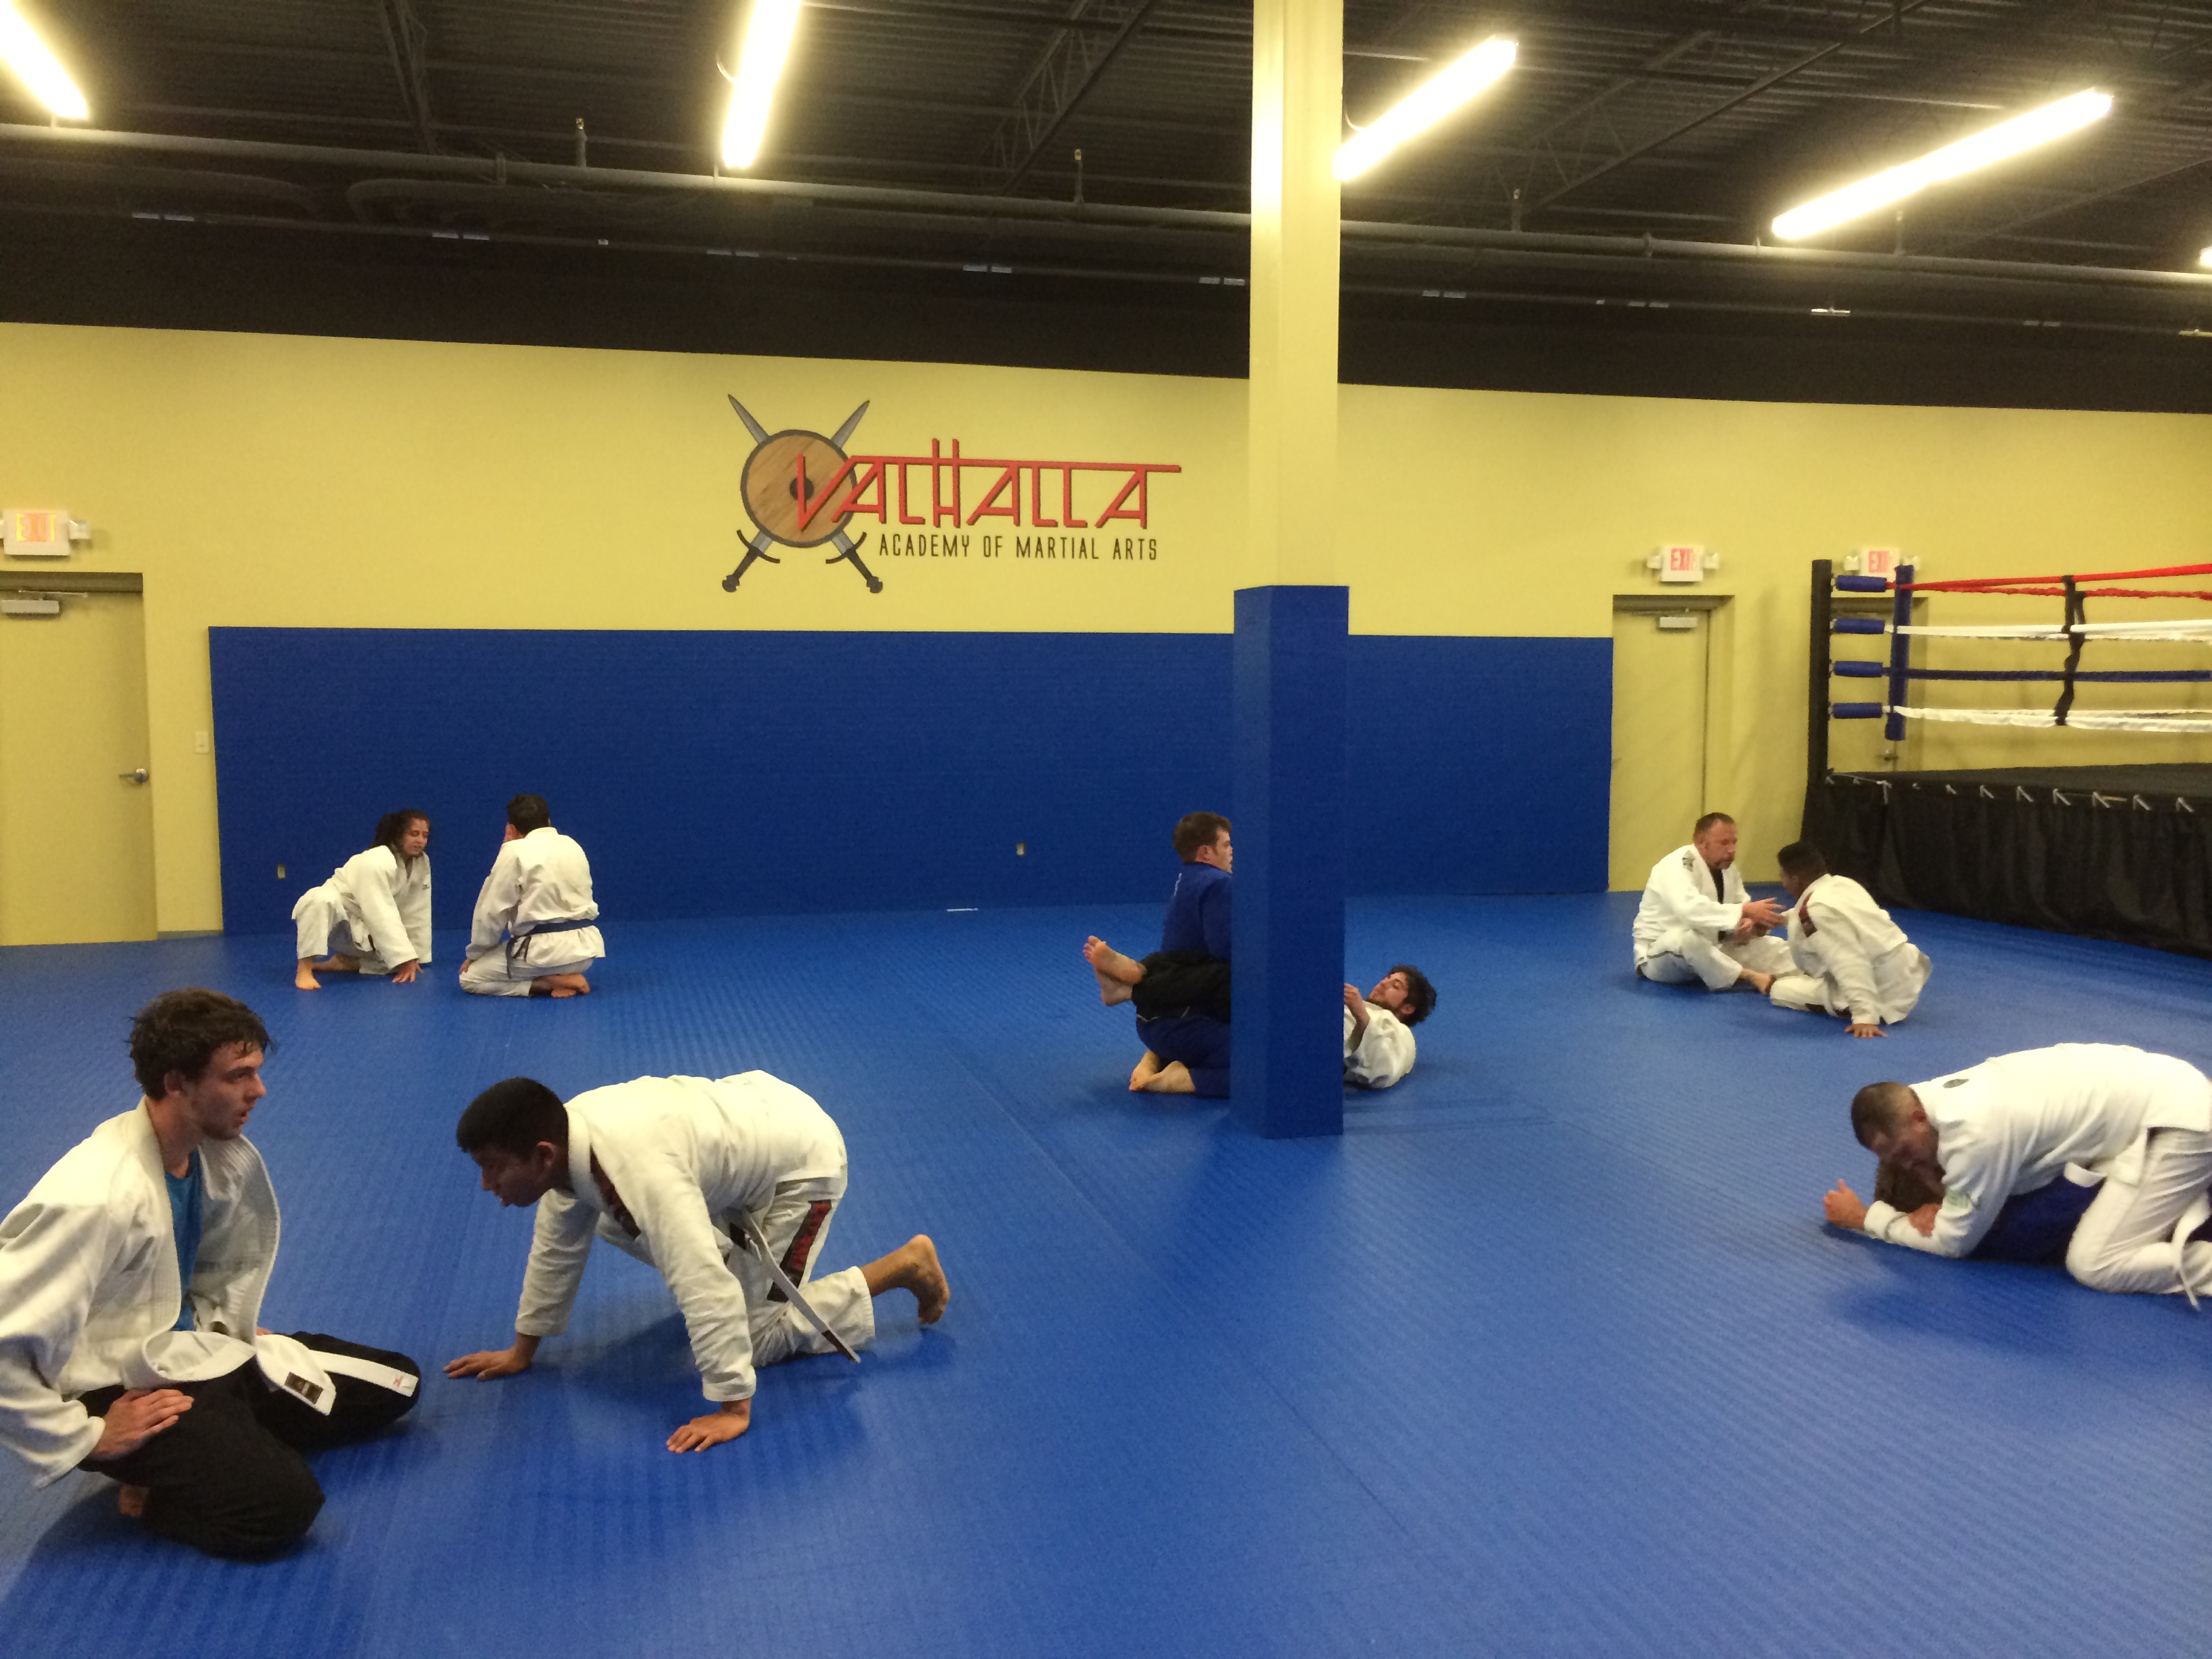 Valhalla Academy of Martial Arts image 11